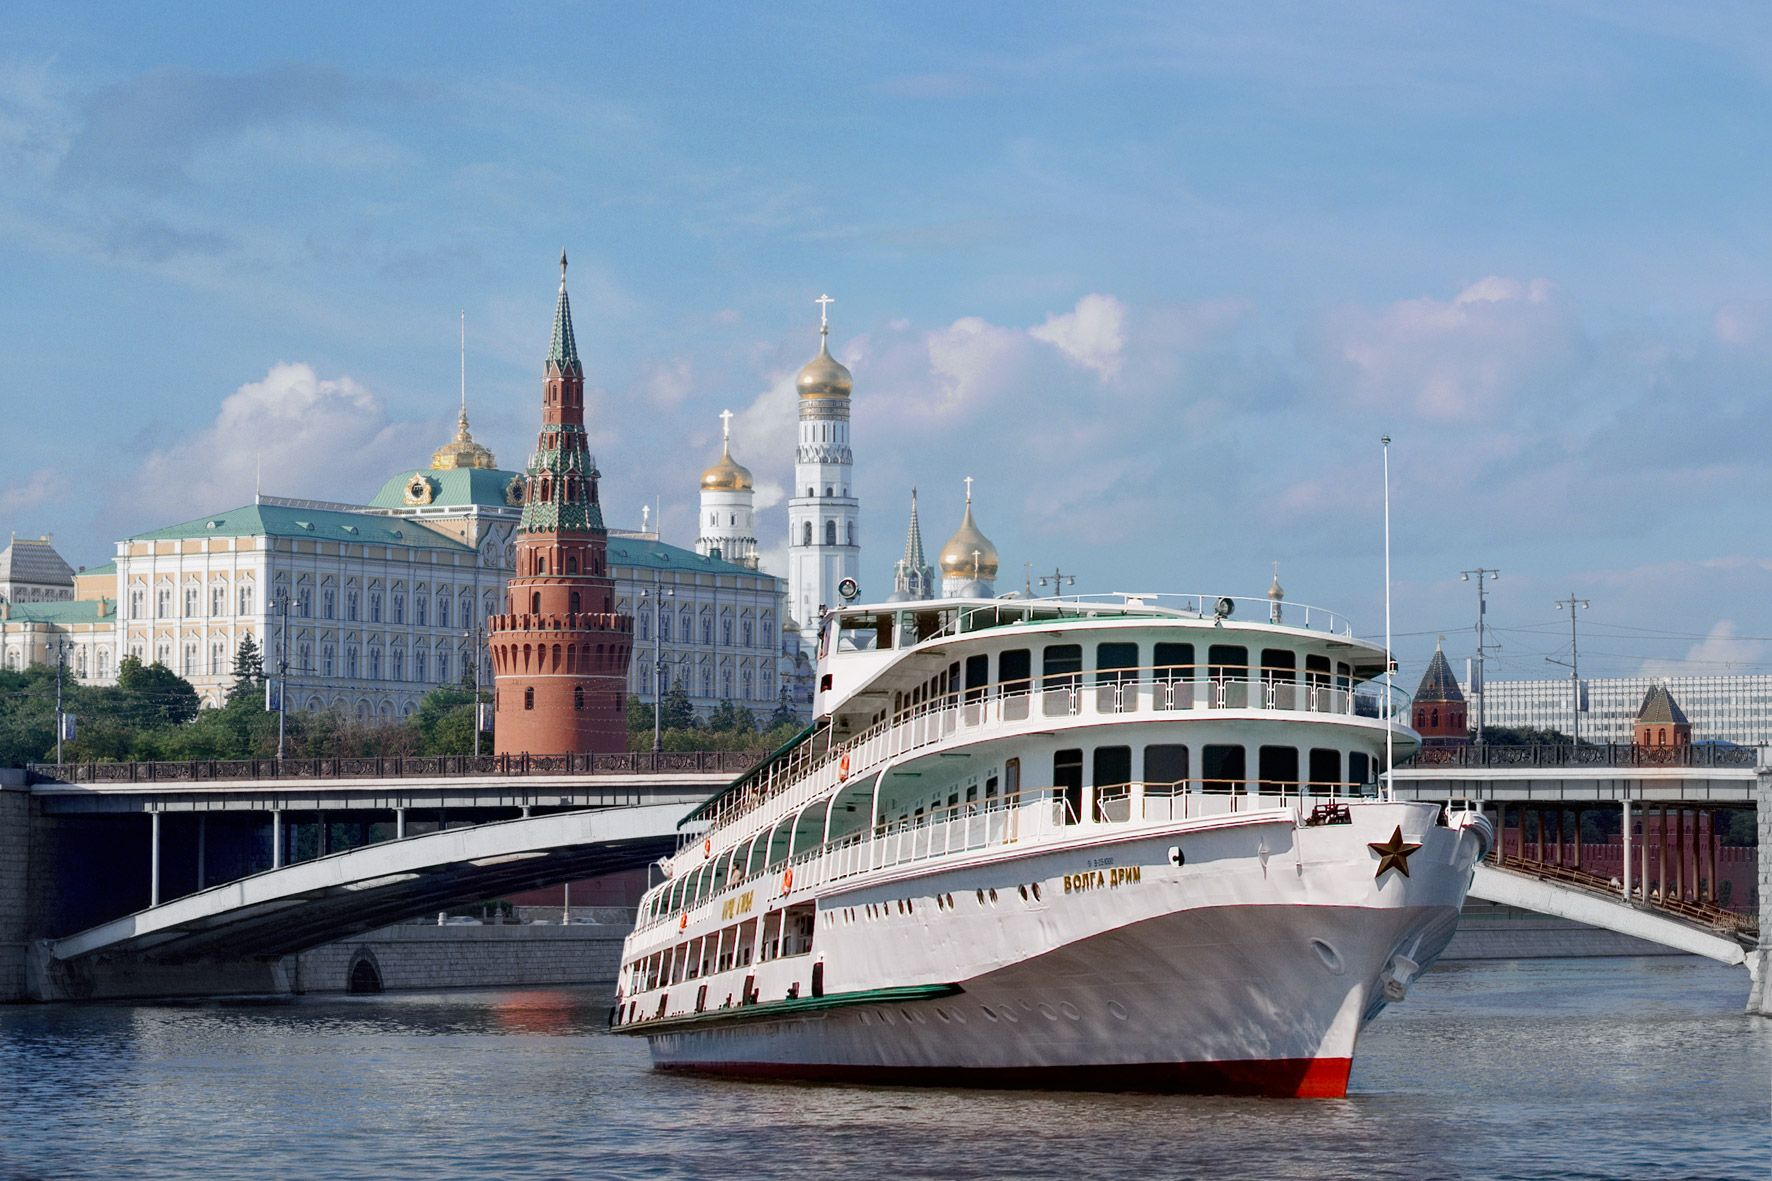 фото с кораблем на фоне храма